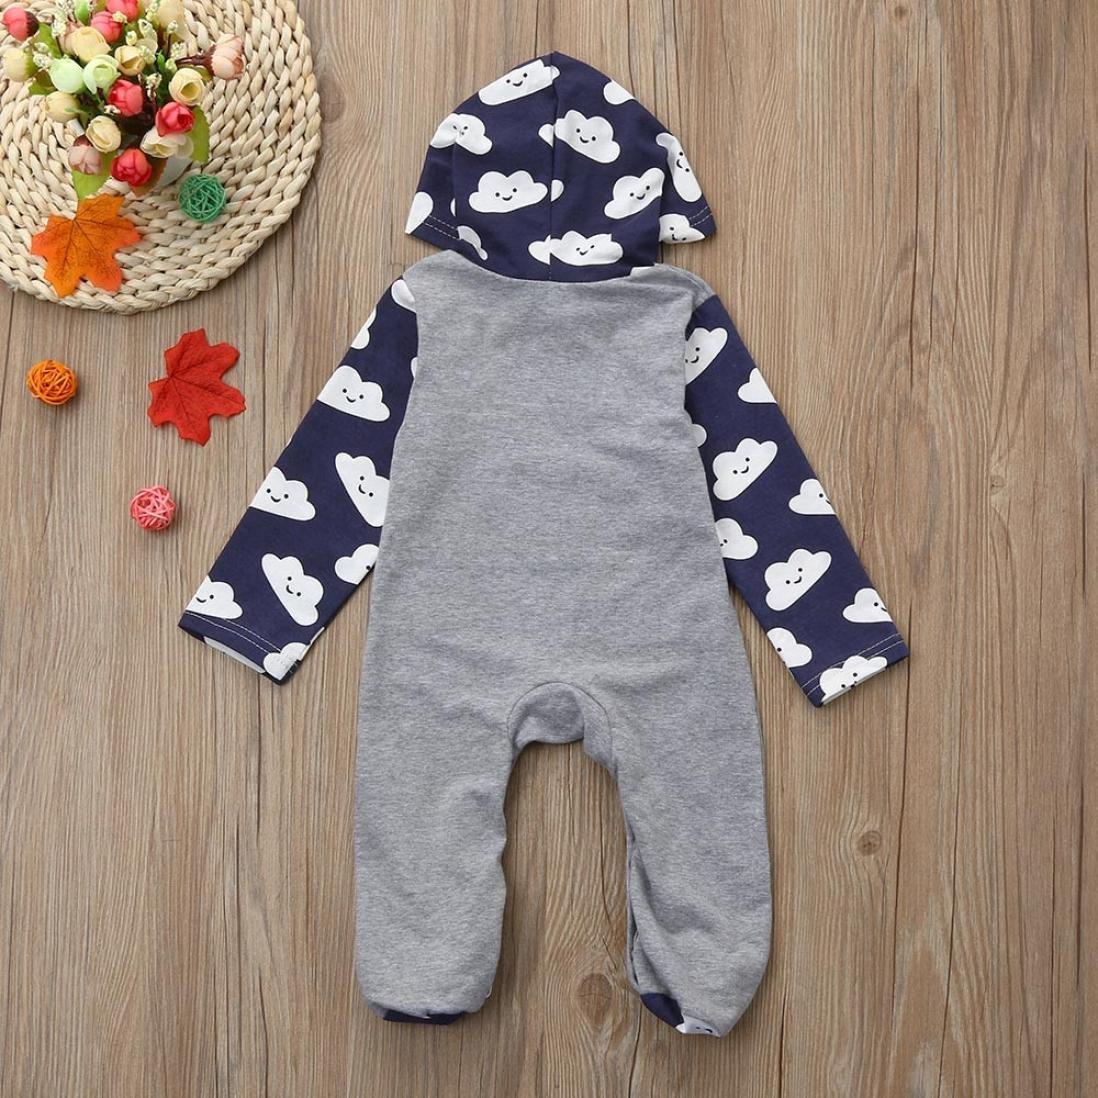 595deef4b Amazon.com  iumei Infant Onesie Boy Girl Cloud Print Long Sleeve ...